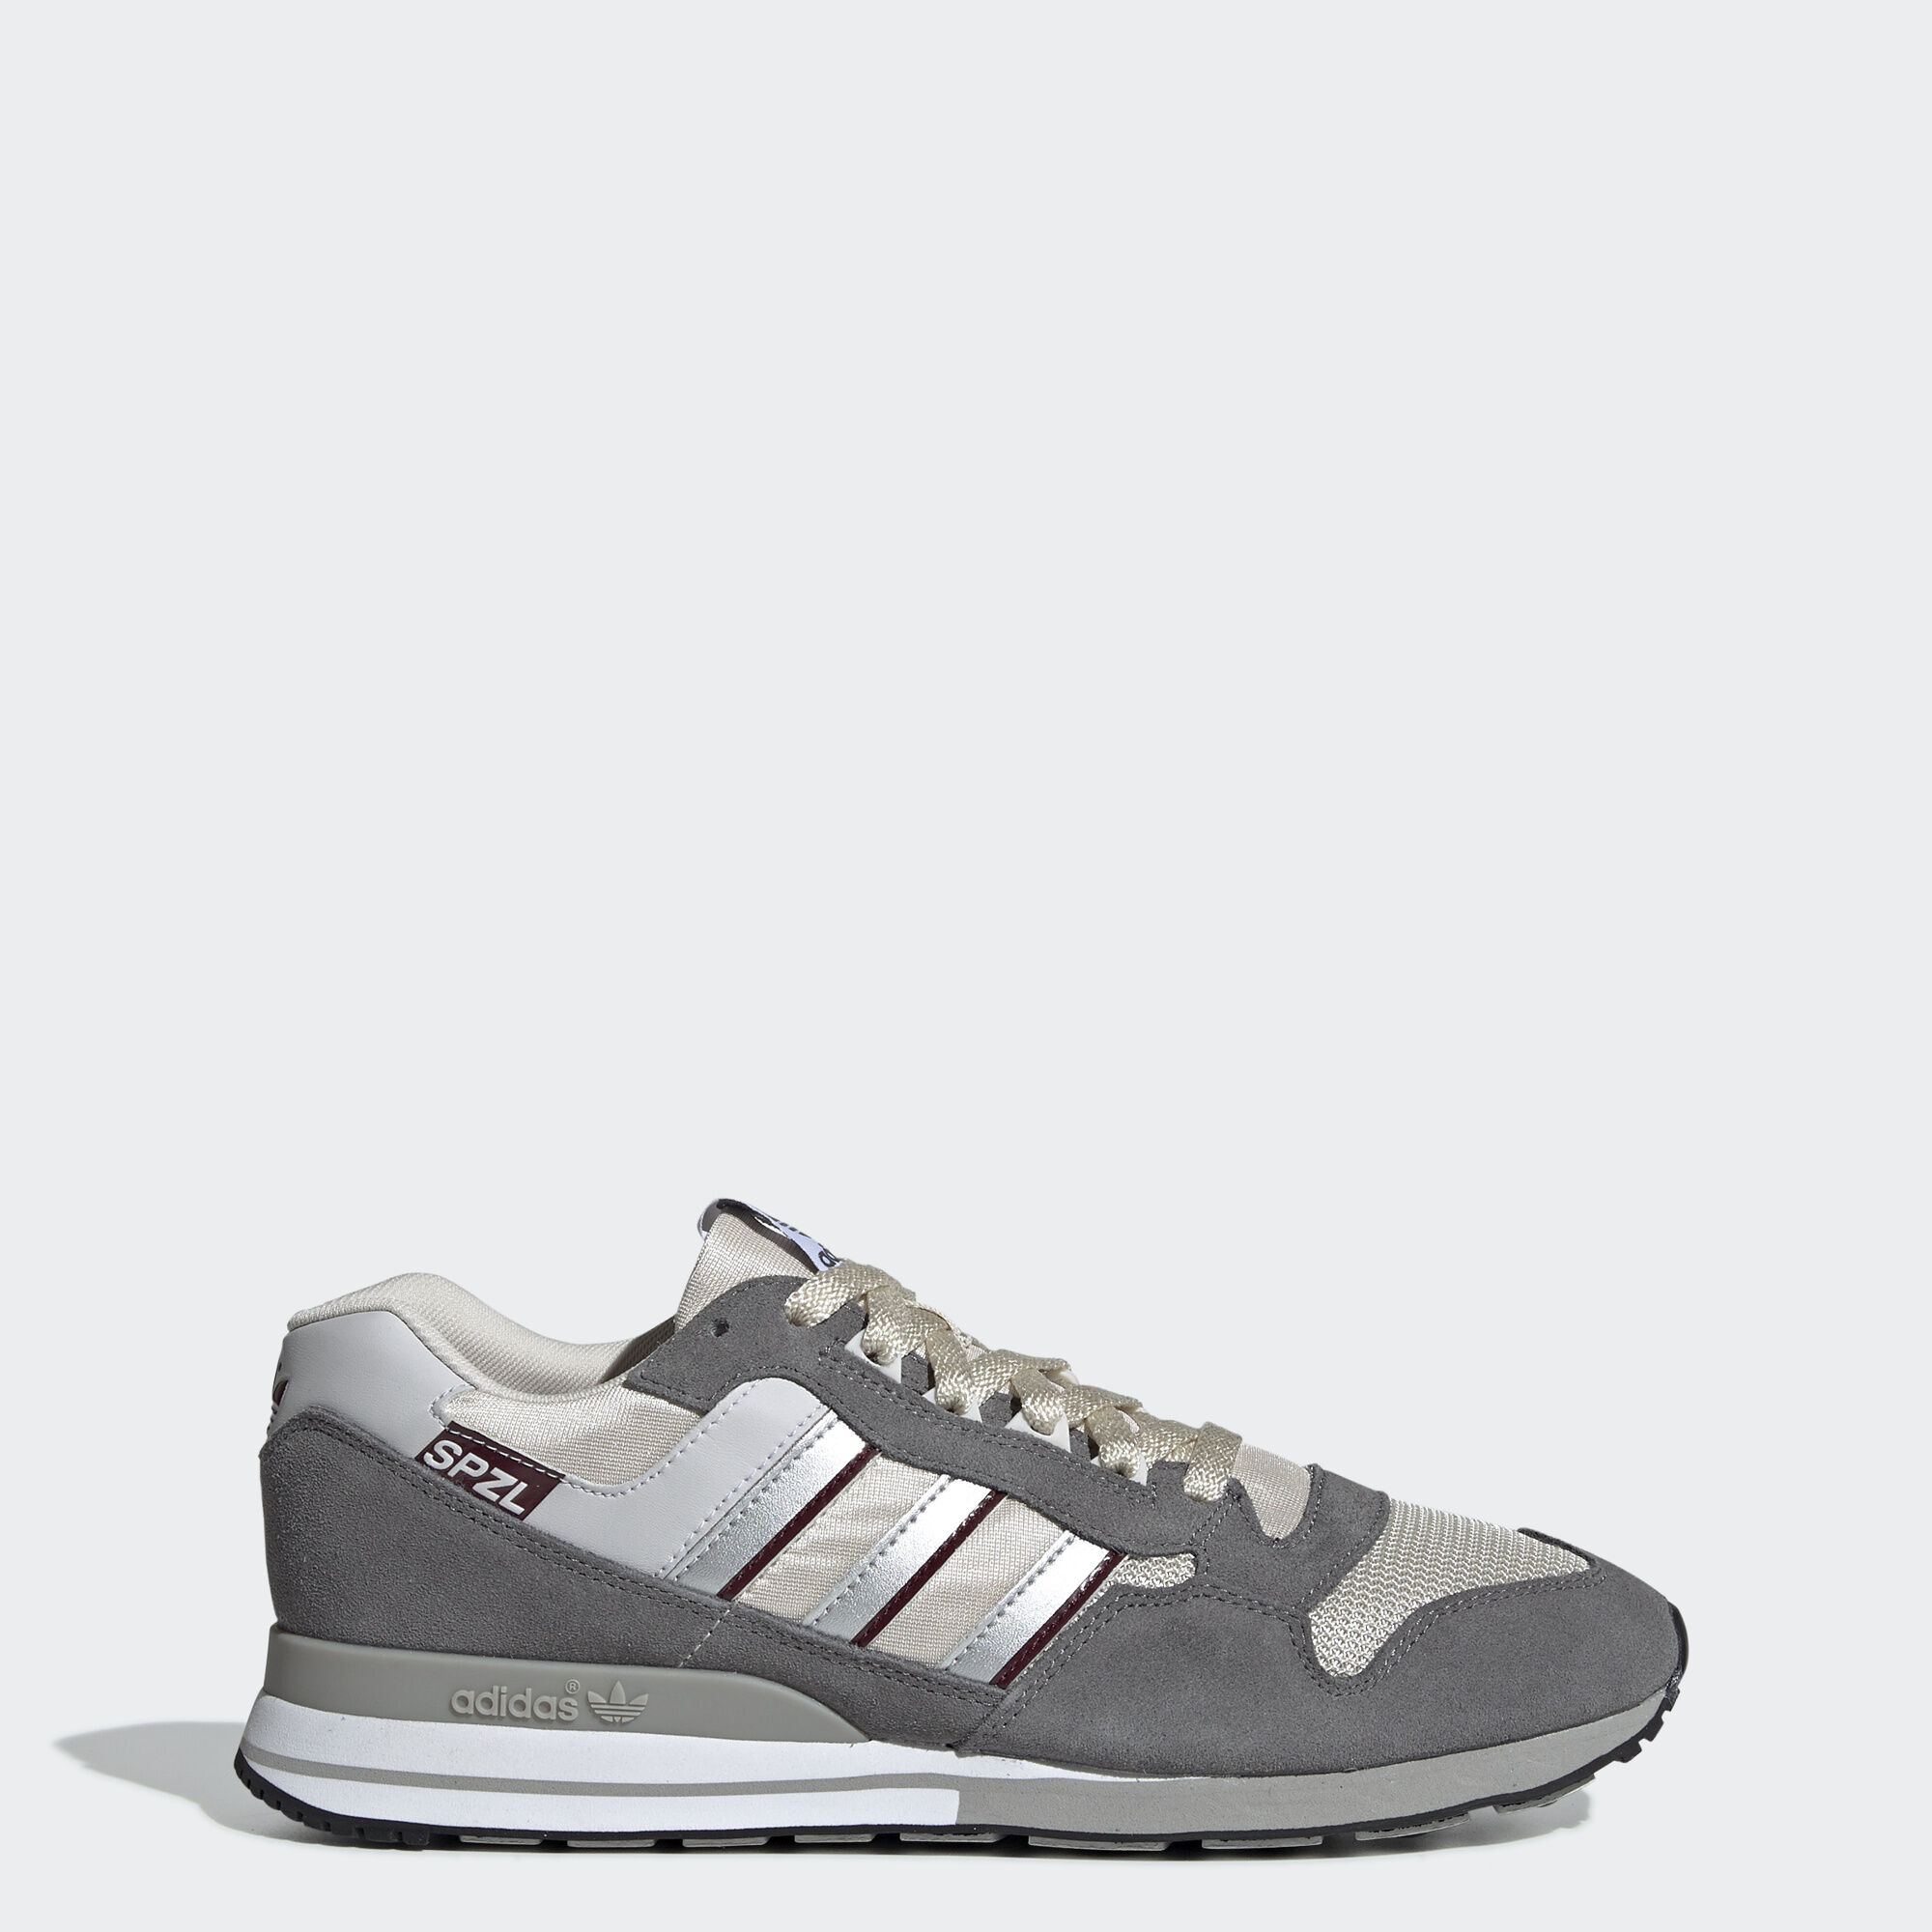 huge discount 4ca01 99273 ZX 530 SPZL Shoes